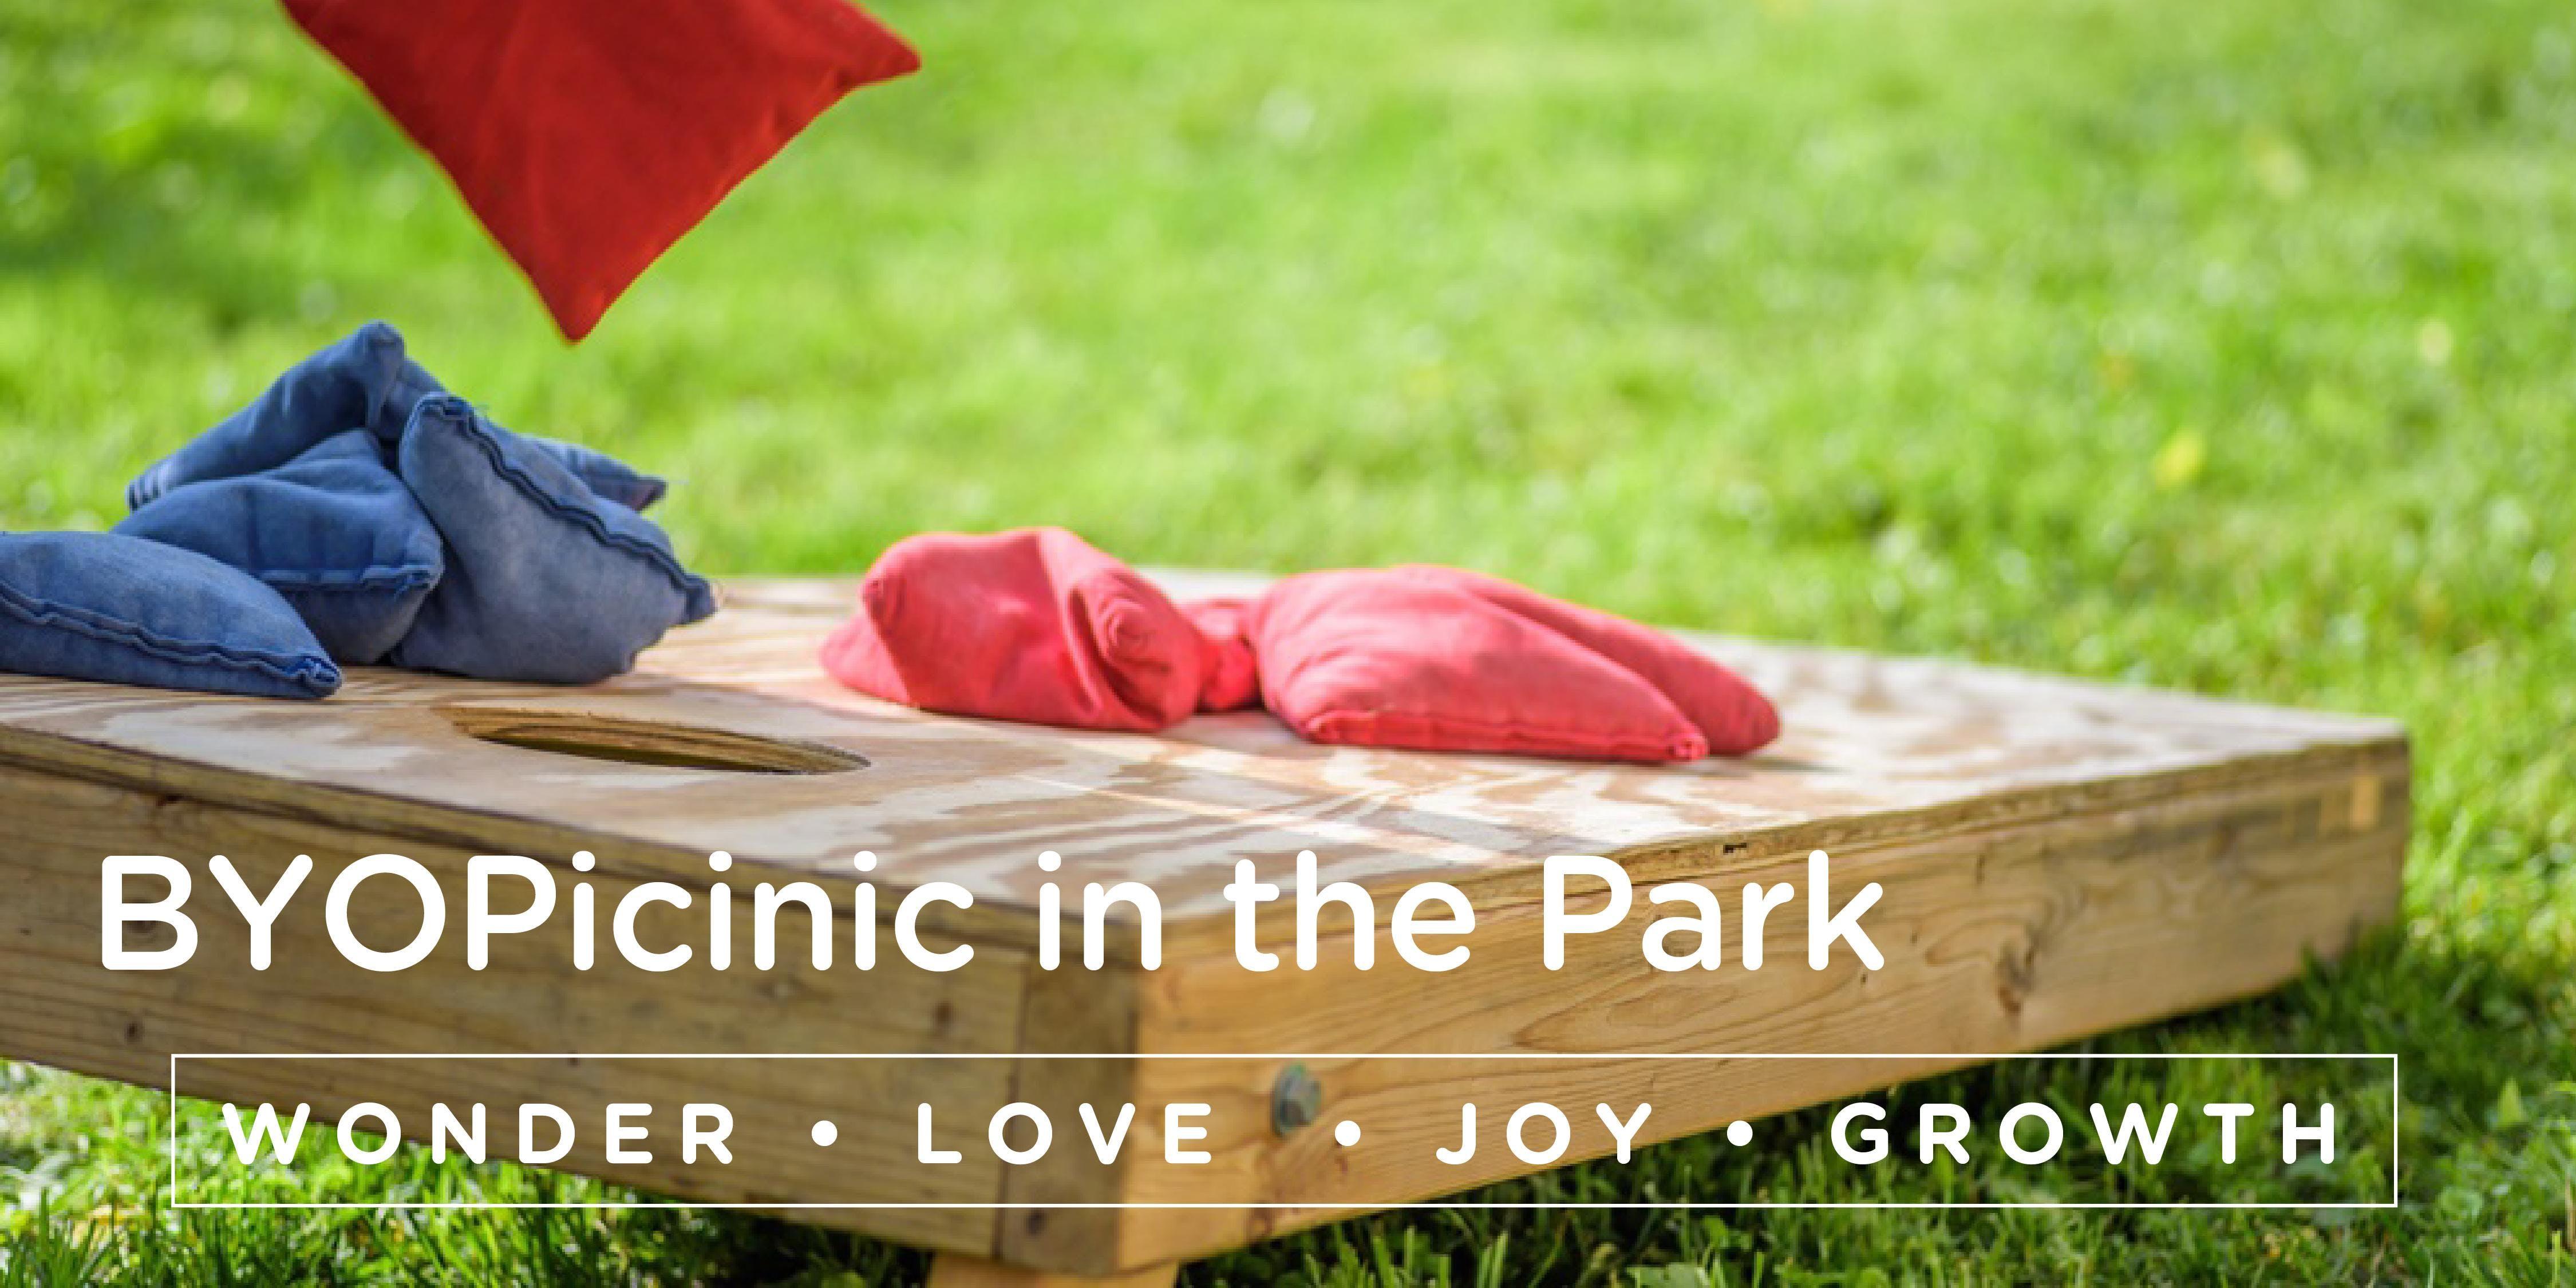 BYOPicnic in the Park